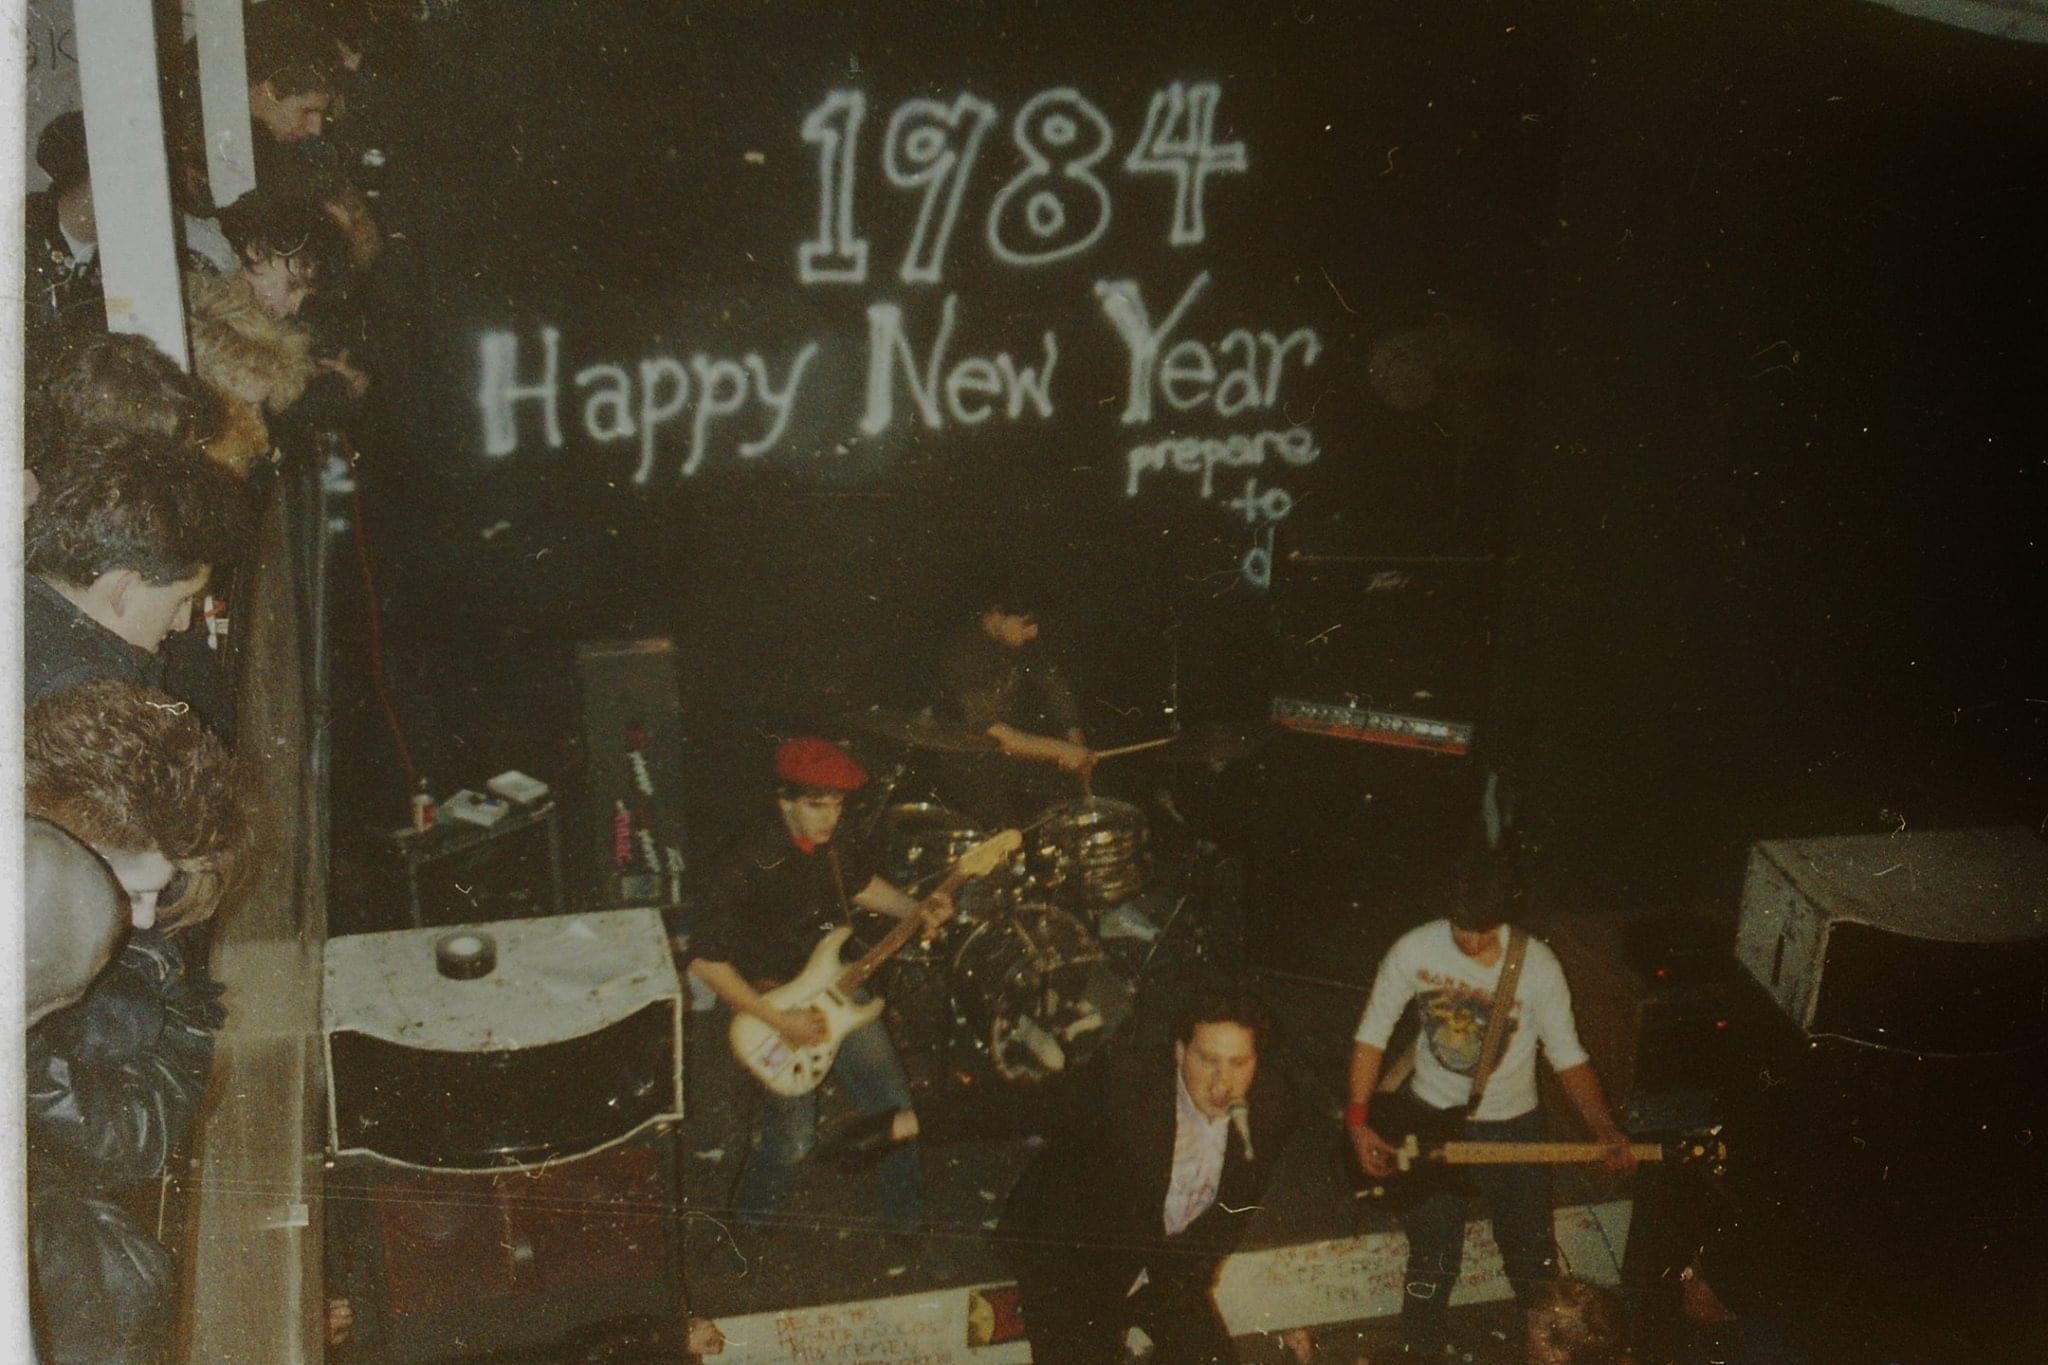 LG-1984